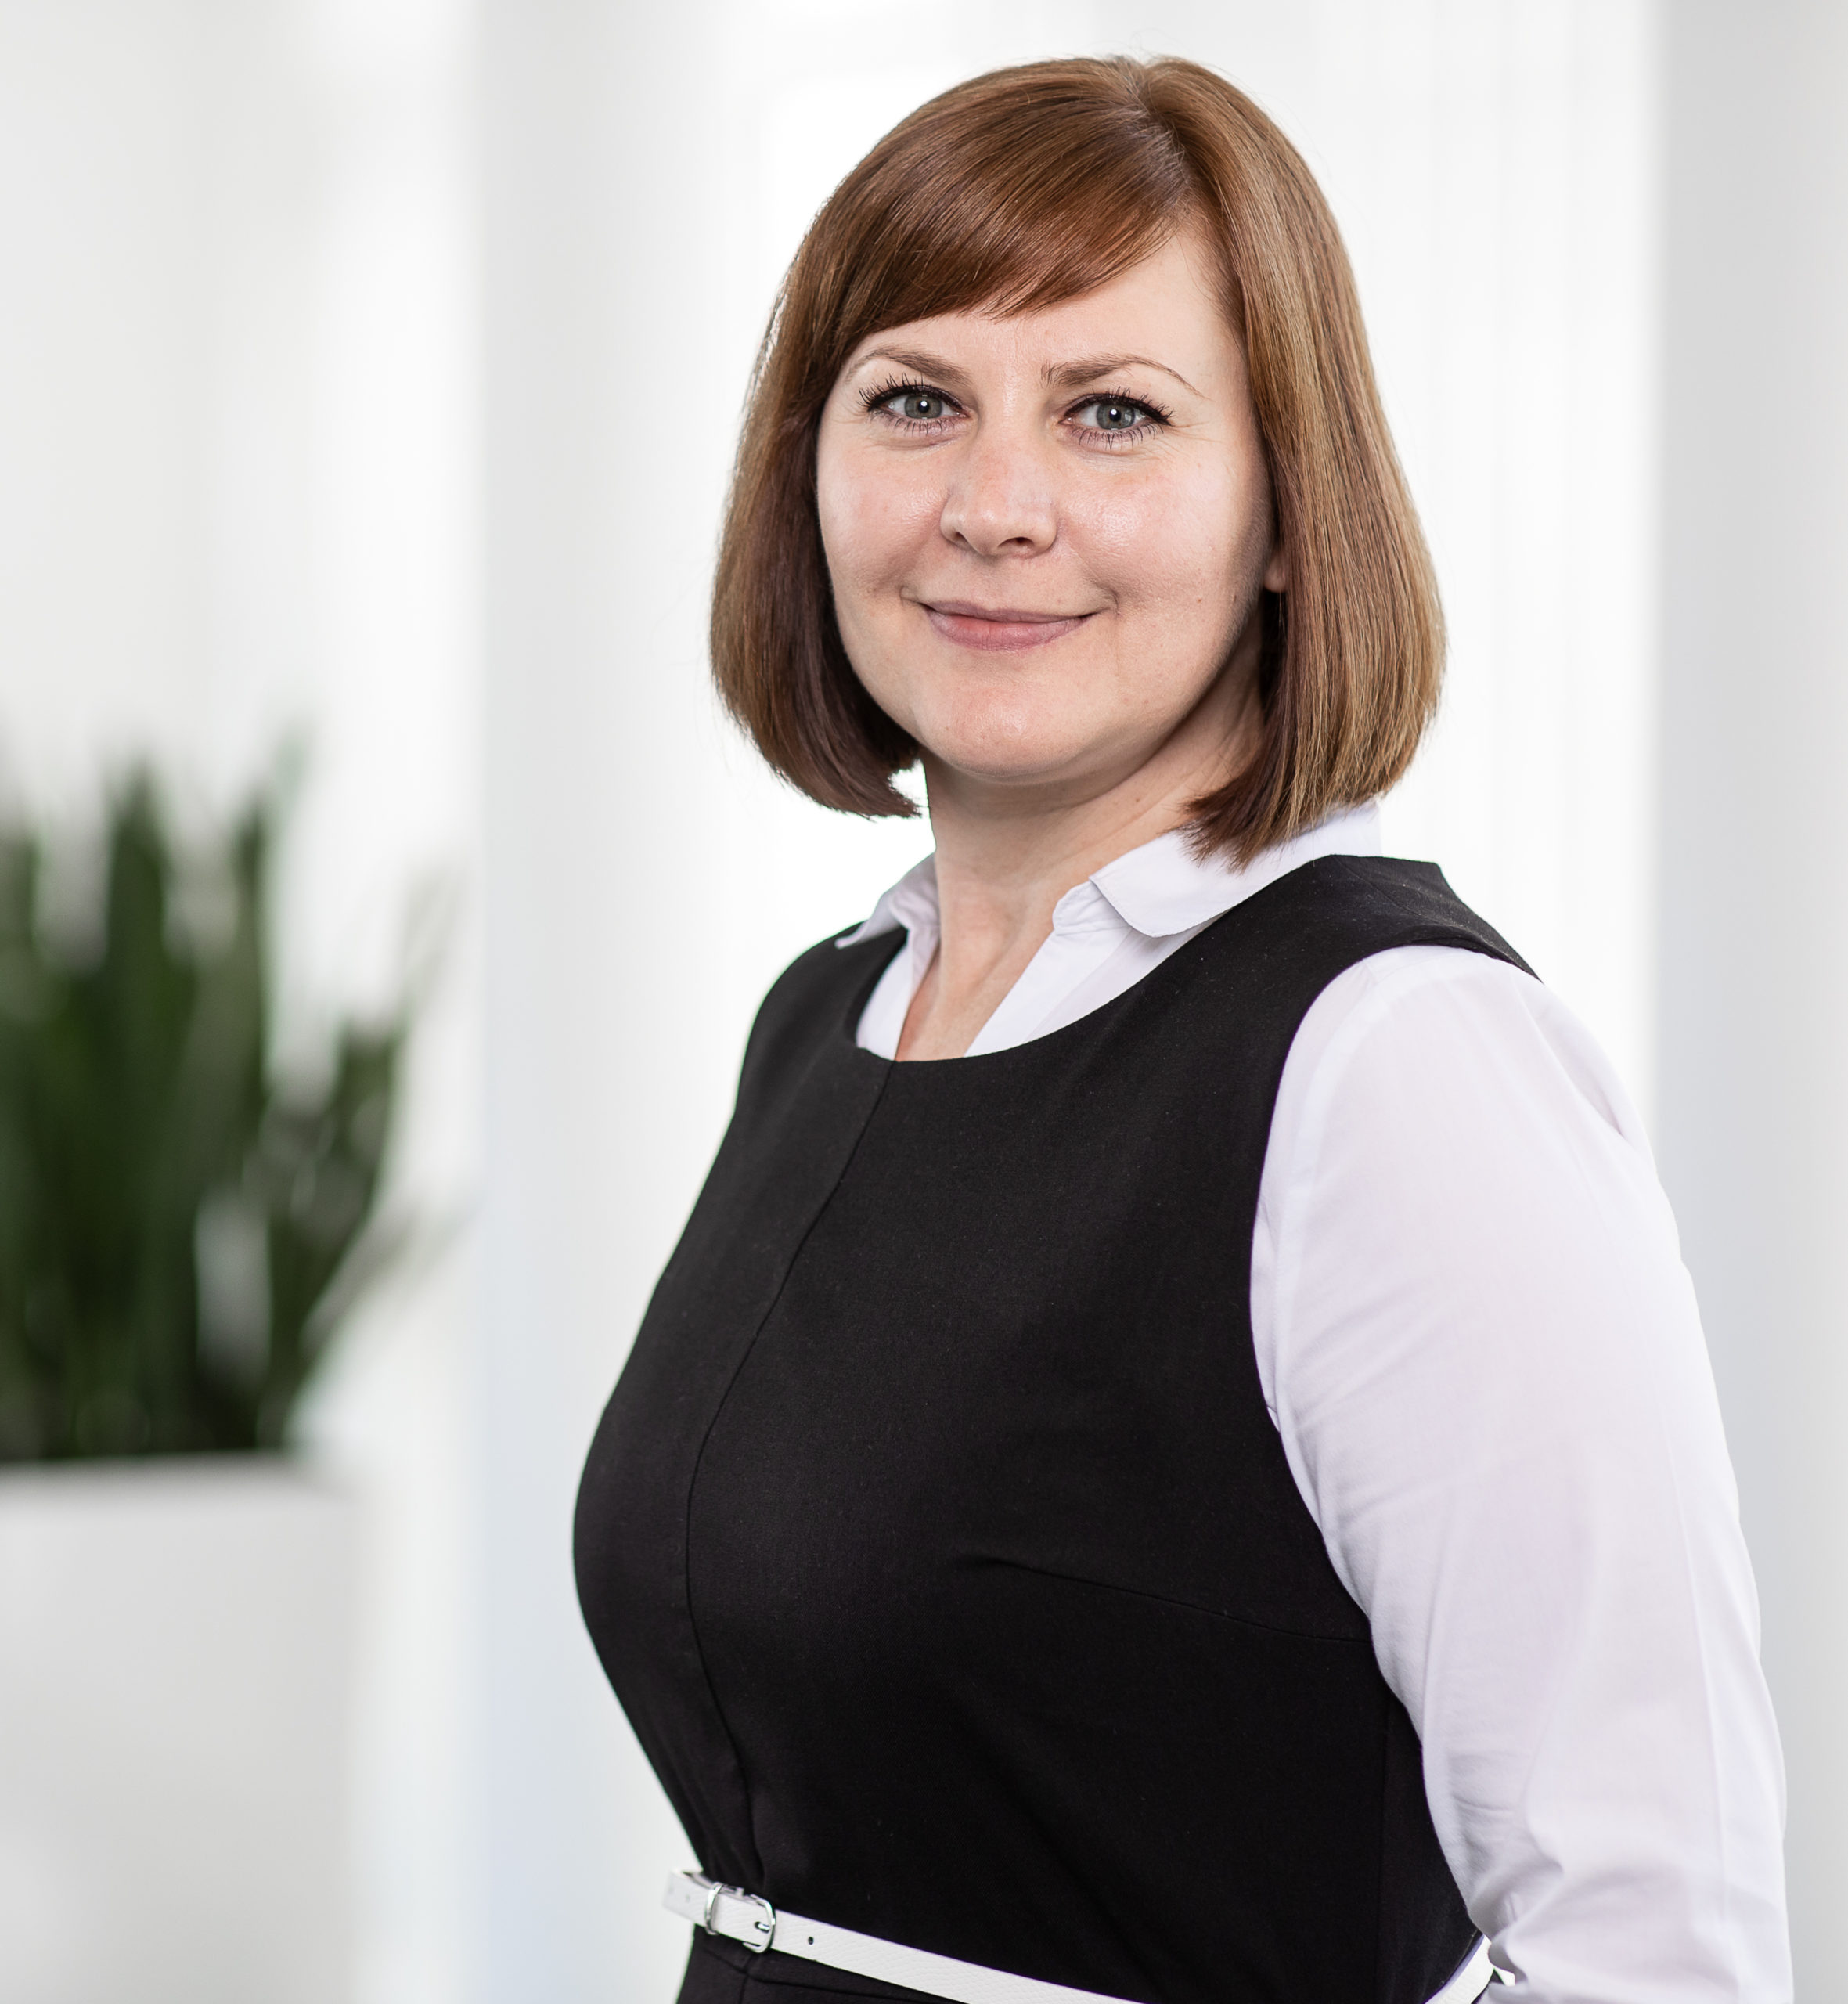 Lena Richter